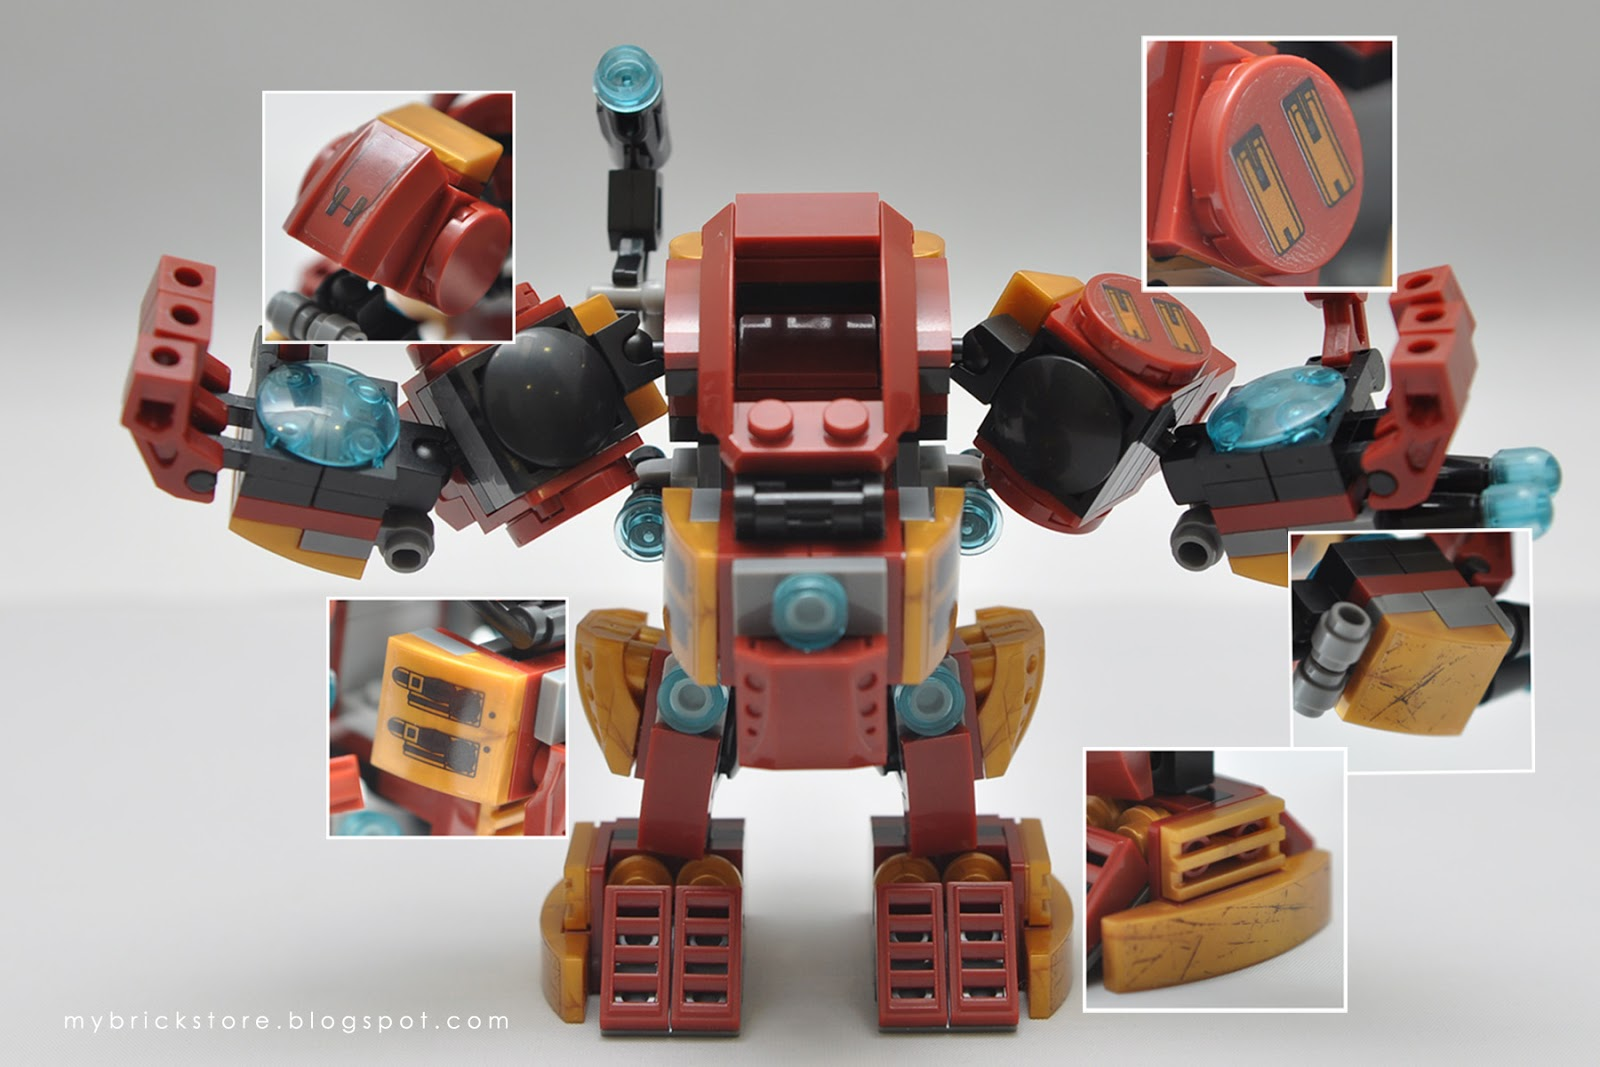 My Brick Store: Sheng Yuan SY360A Iron Man Mecha Hulkbuster